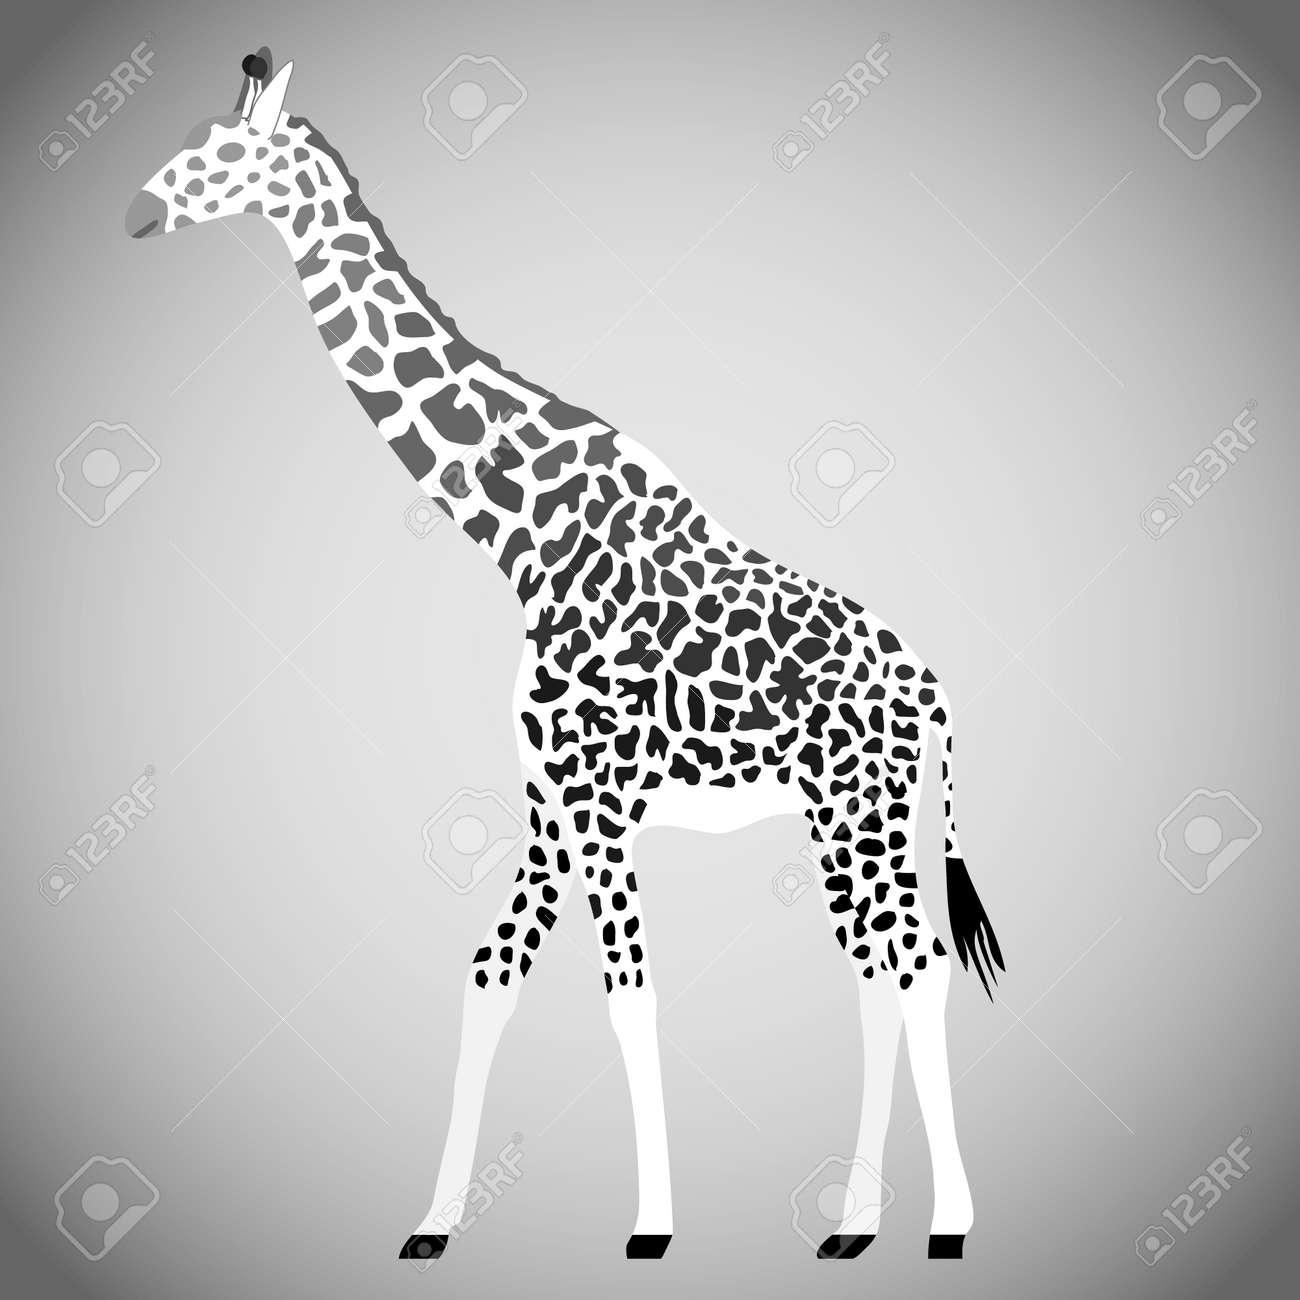 Giraffe in black and white. Giraffe isolated on a light background. Vector illustration. Vector. - 167578726